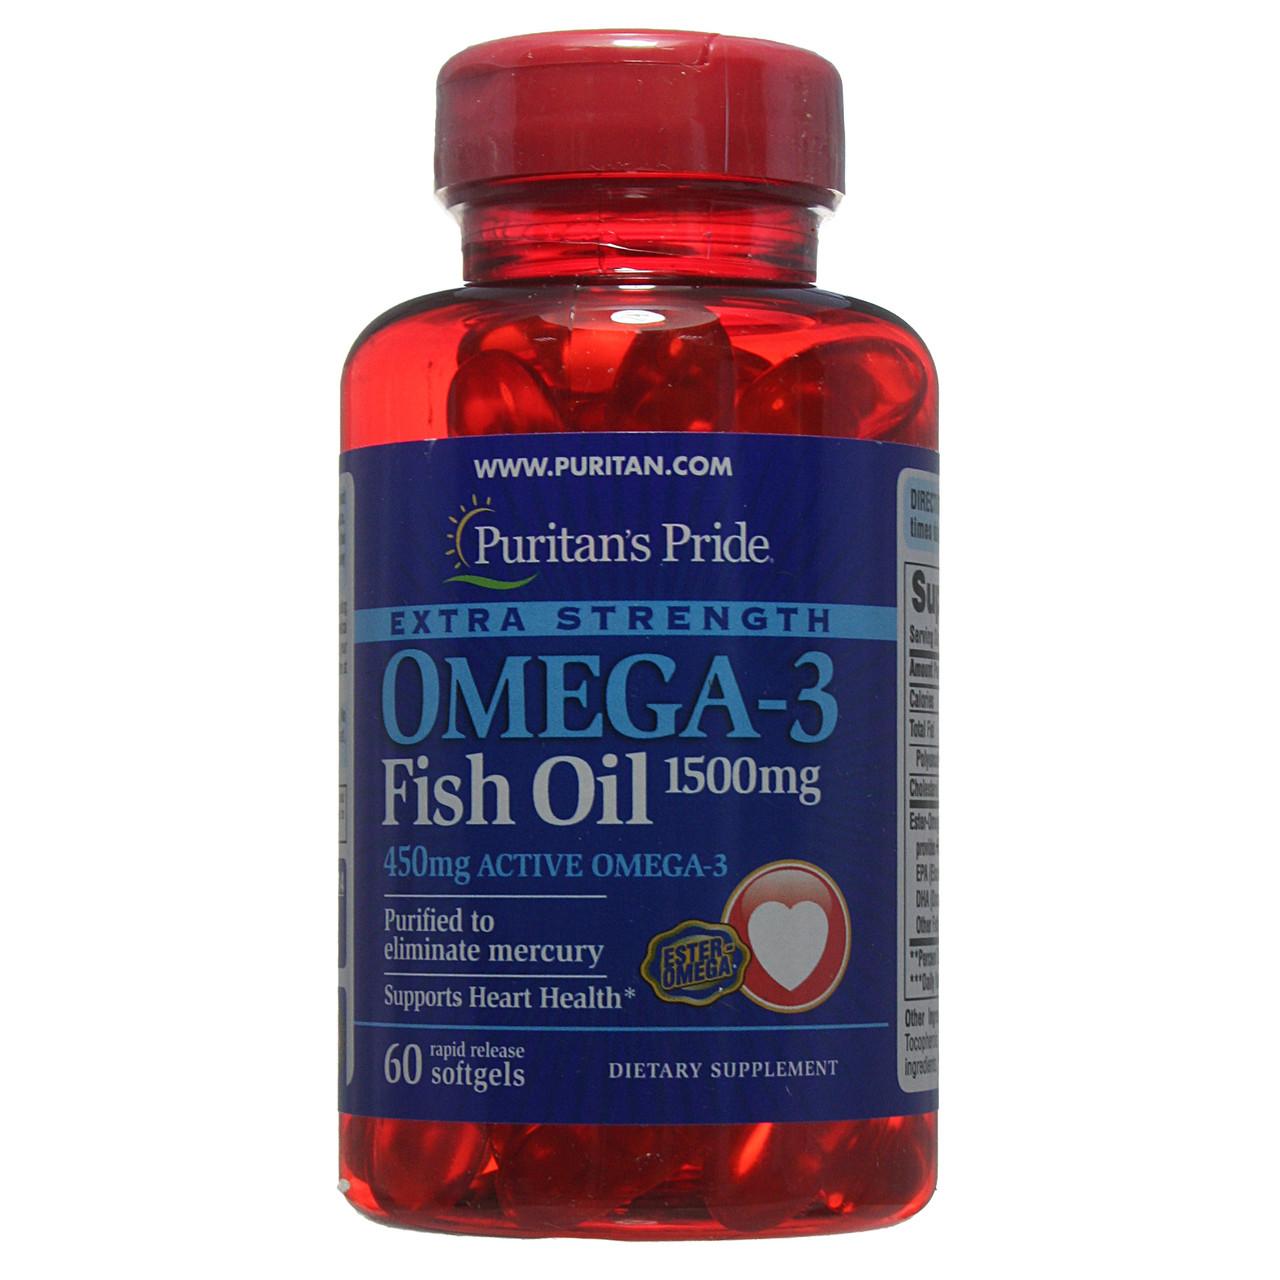 Омега-3 рыбий жир, Extra Strength Omega-3 Fish Oil 1500 mg (450 mg Active Omega-3), Puritan's Pride, 60 капсул